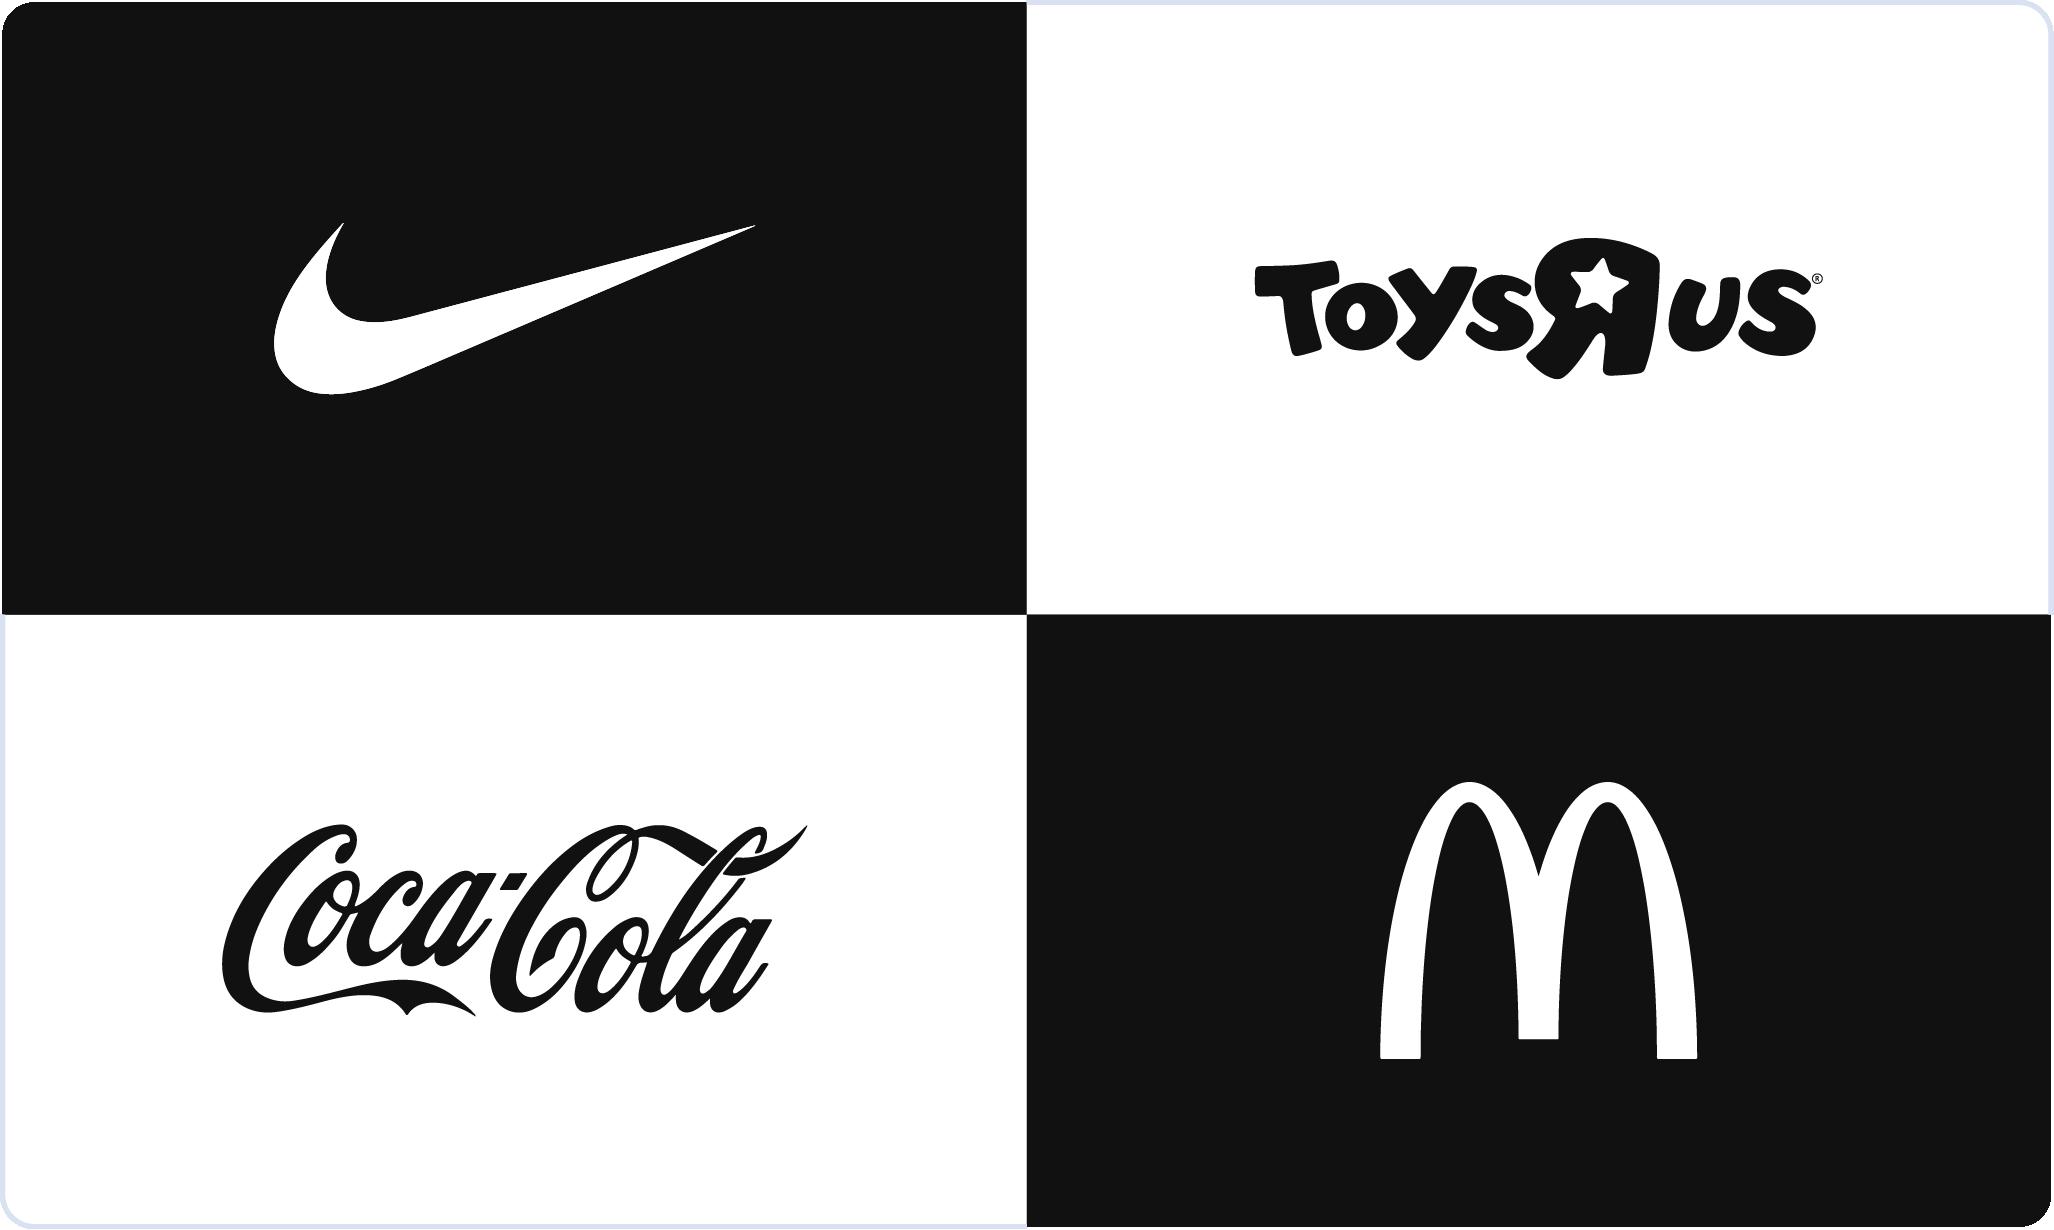 Iconic logos: Nike, Toys R Us, Coca-Cola, McDonalds